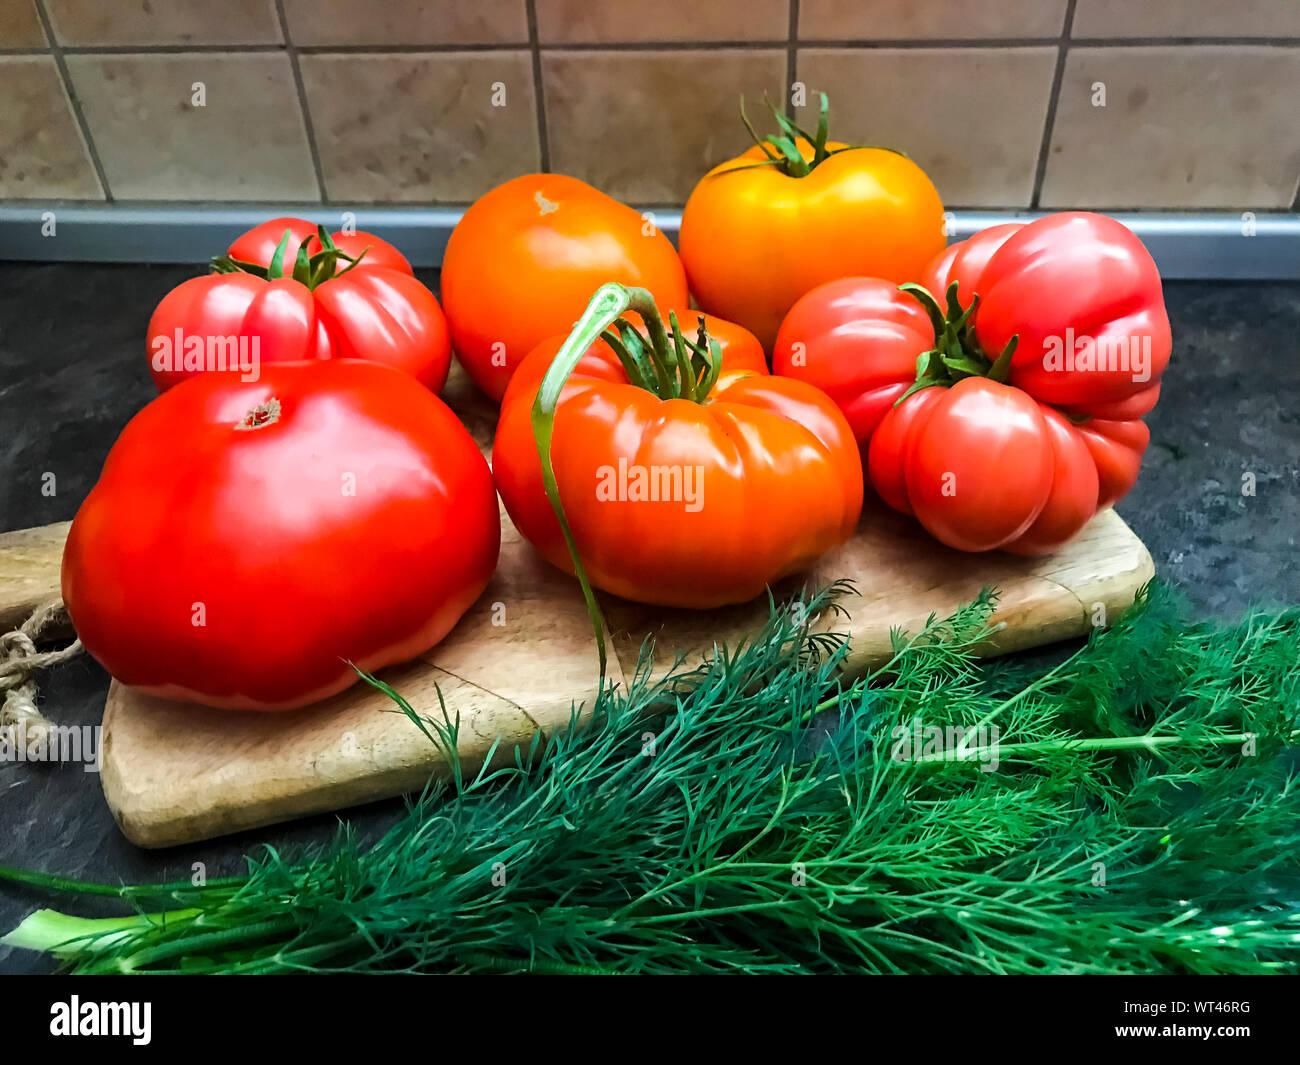 Multicolored fresh tomatoes on wooden kitchen board. Studio Photo Stock Photo